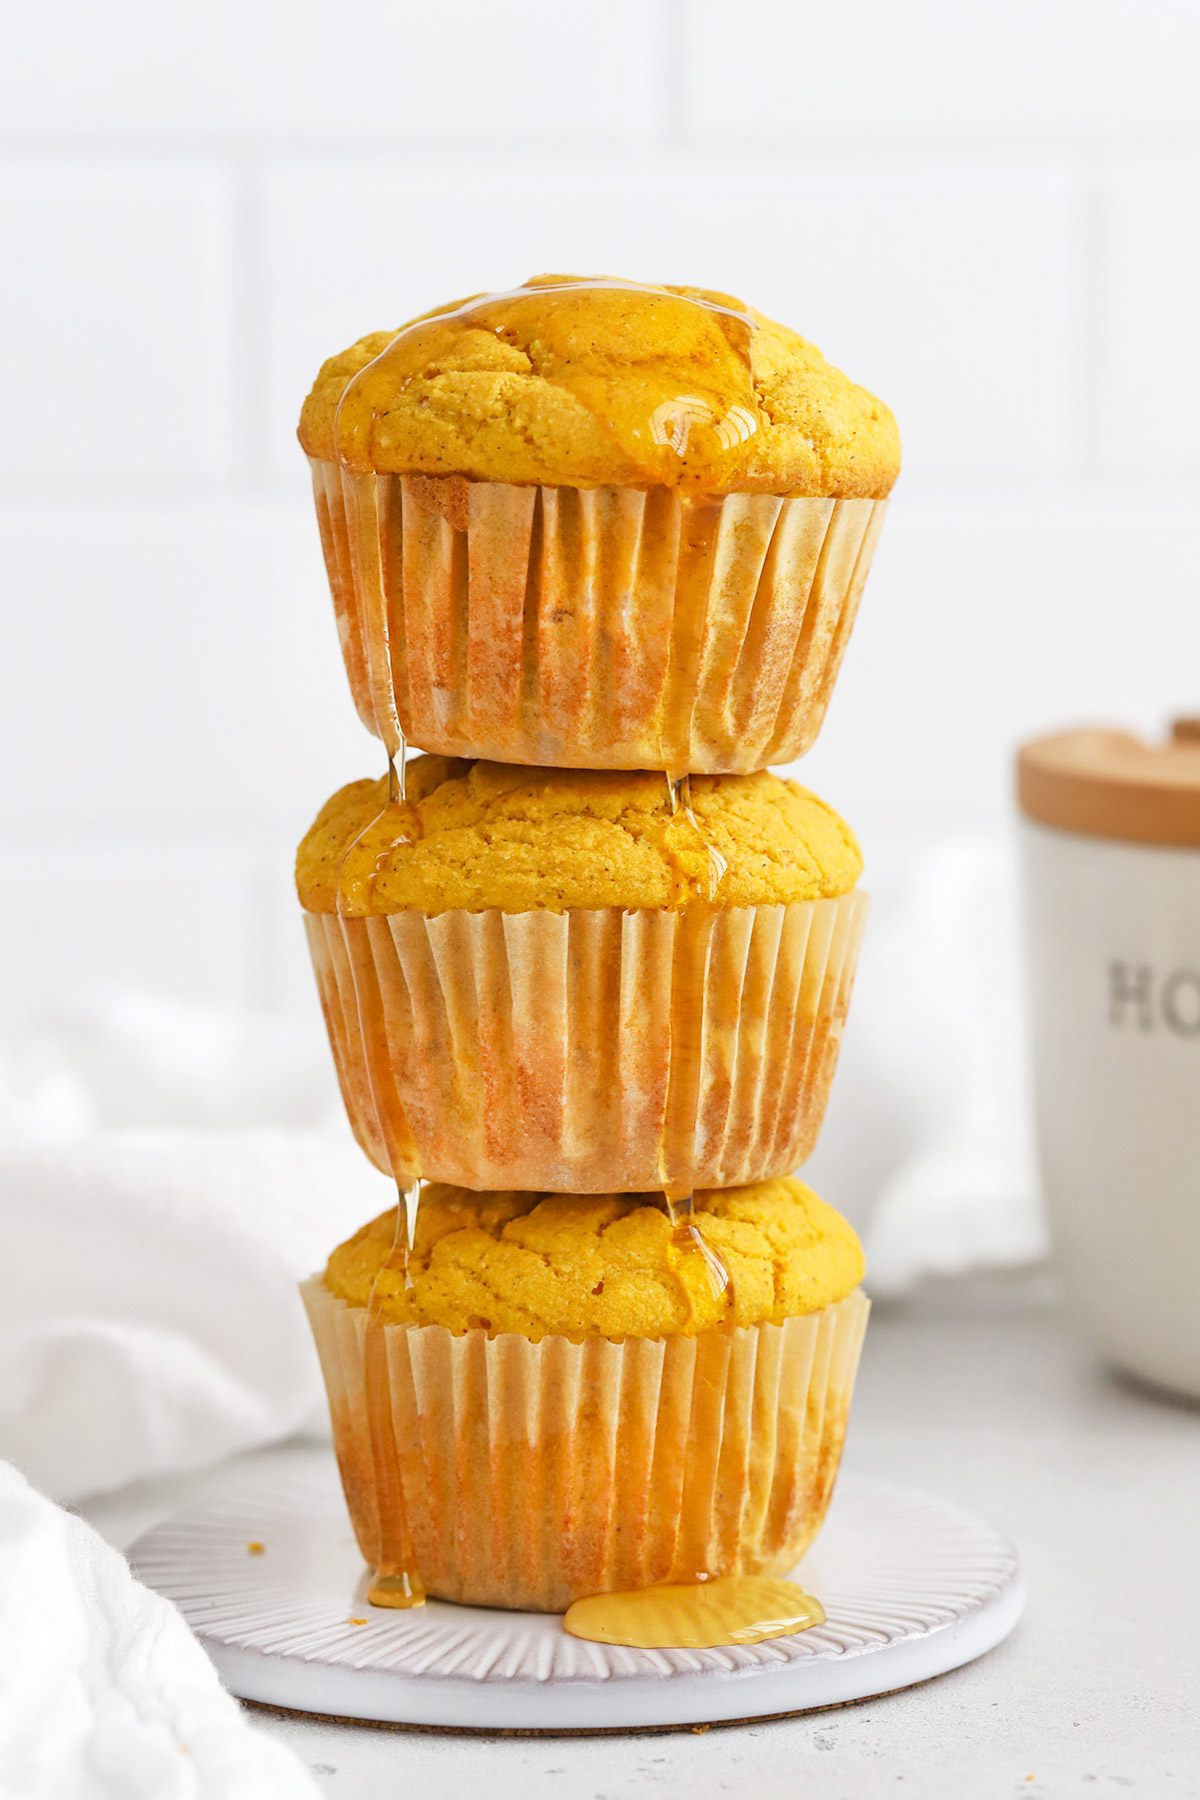 Three gluten-free pumpkin cornbread muffins drizzled with honey